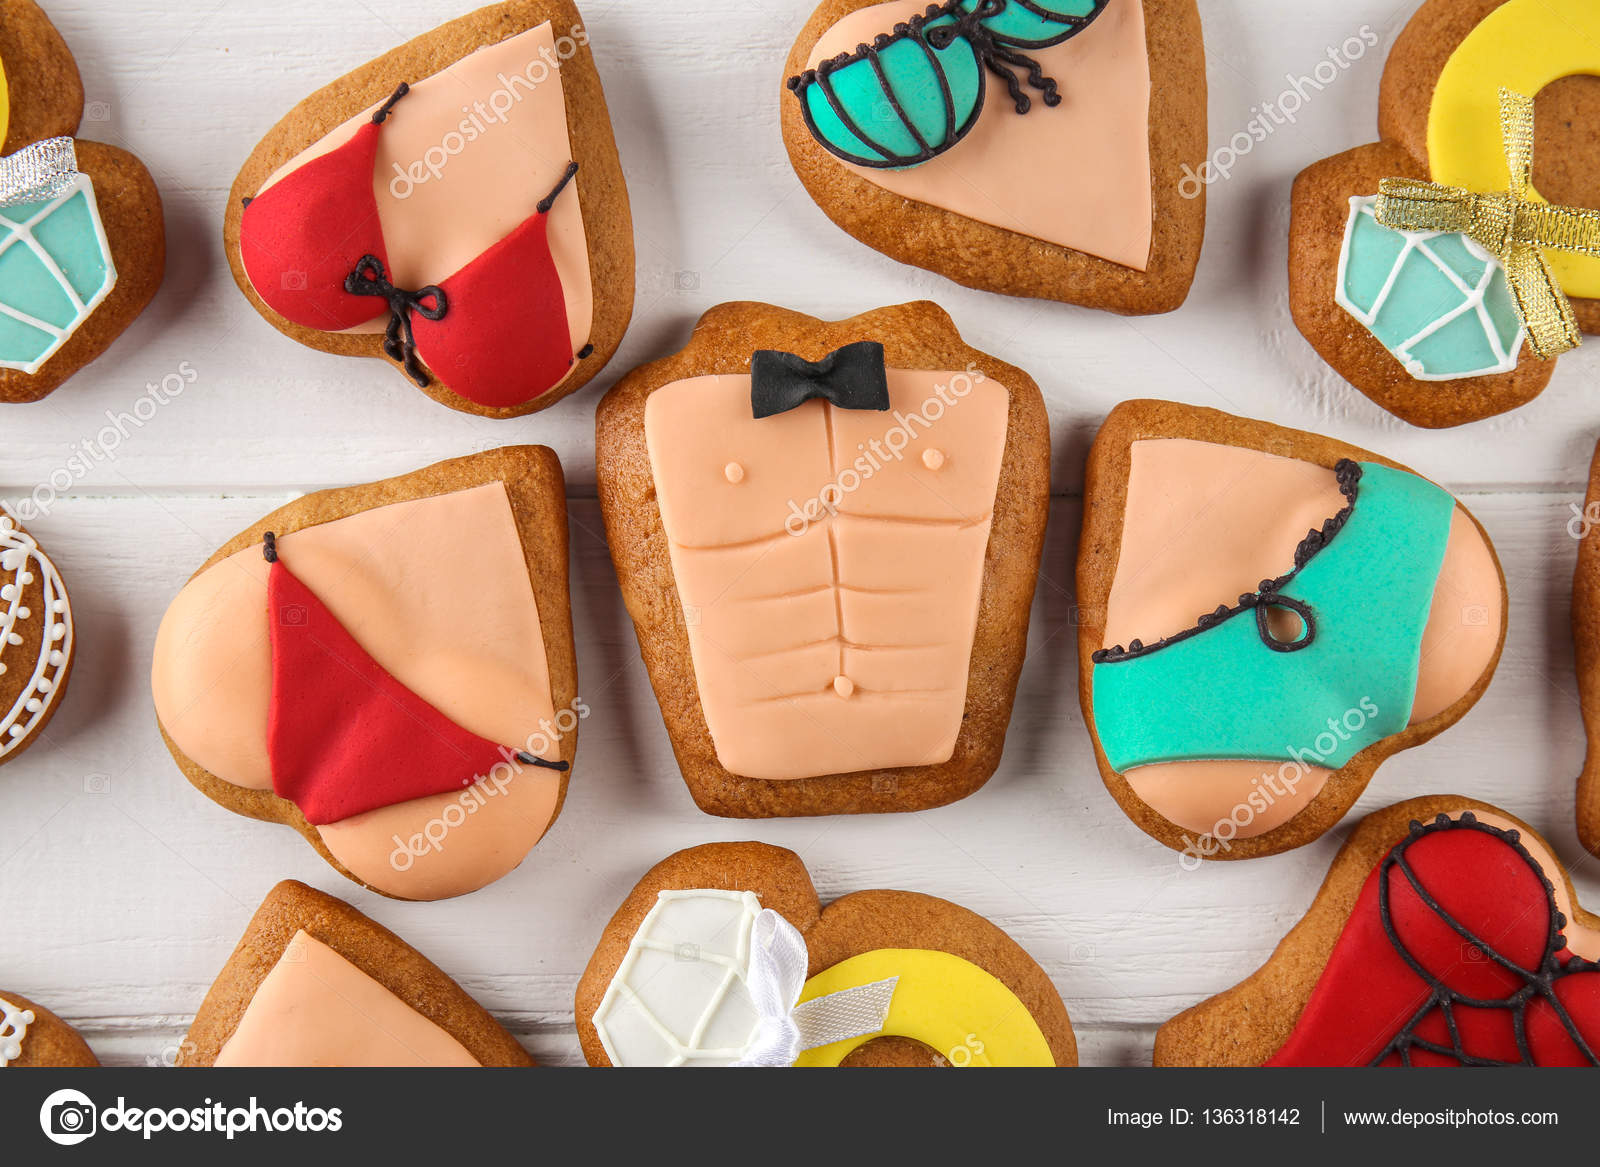 Bachelorette Party Cookies — Stock Photo © Belchonock  136318142